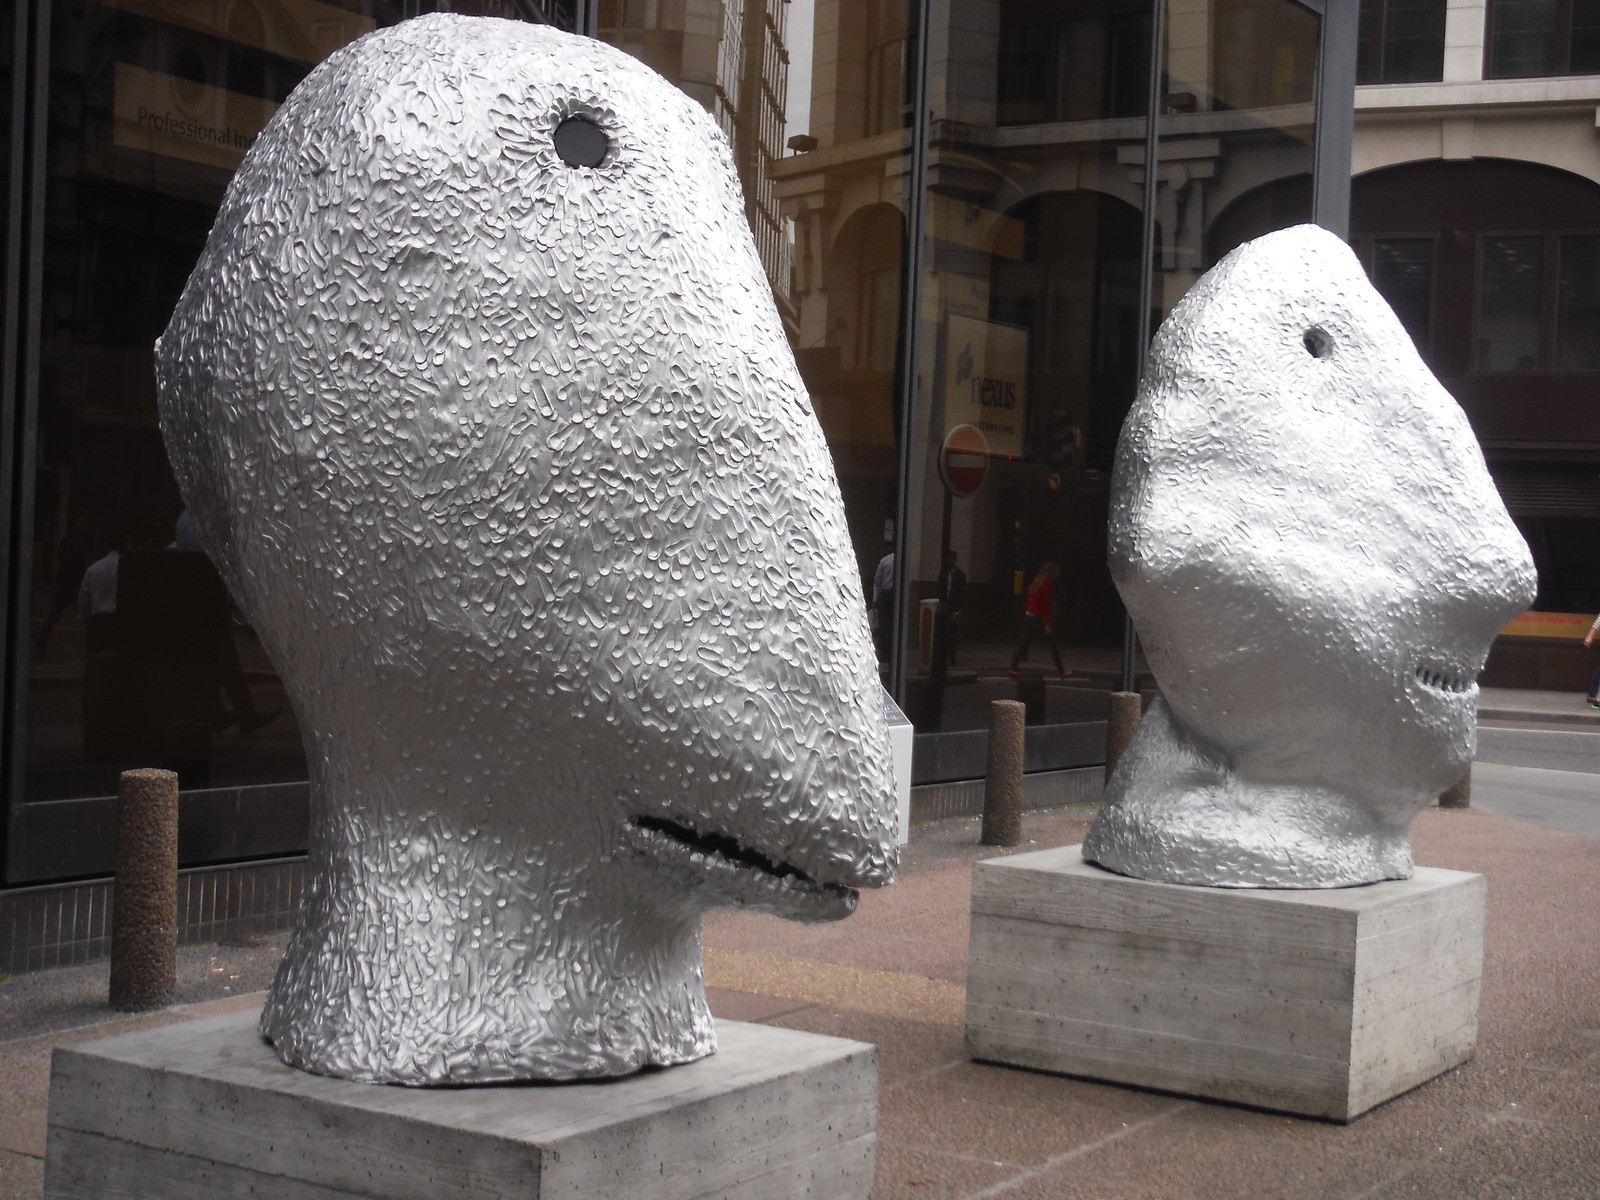 Ugo Rondinone - SUNRISE. east. July & SUNRISE. east. October SWC Walk Short 24 - Sculpture in the City